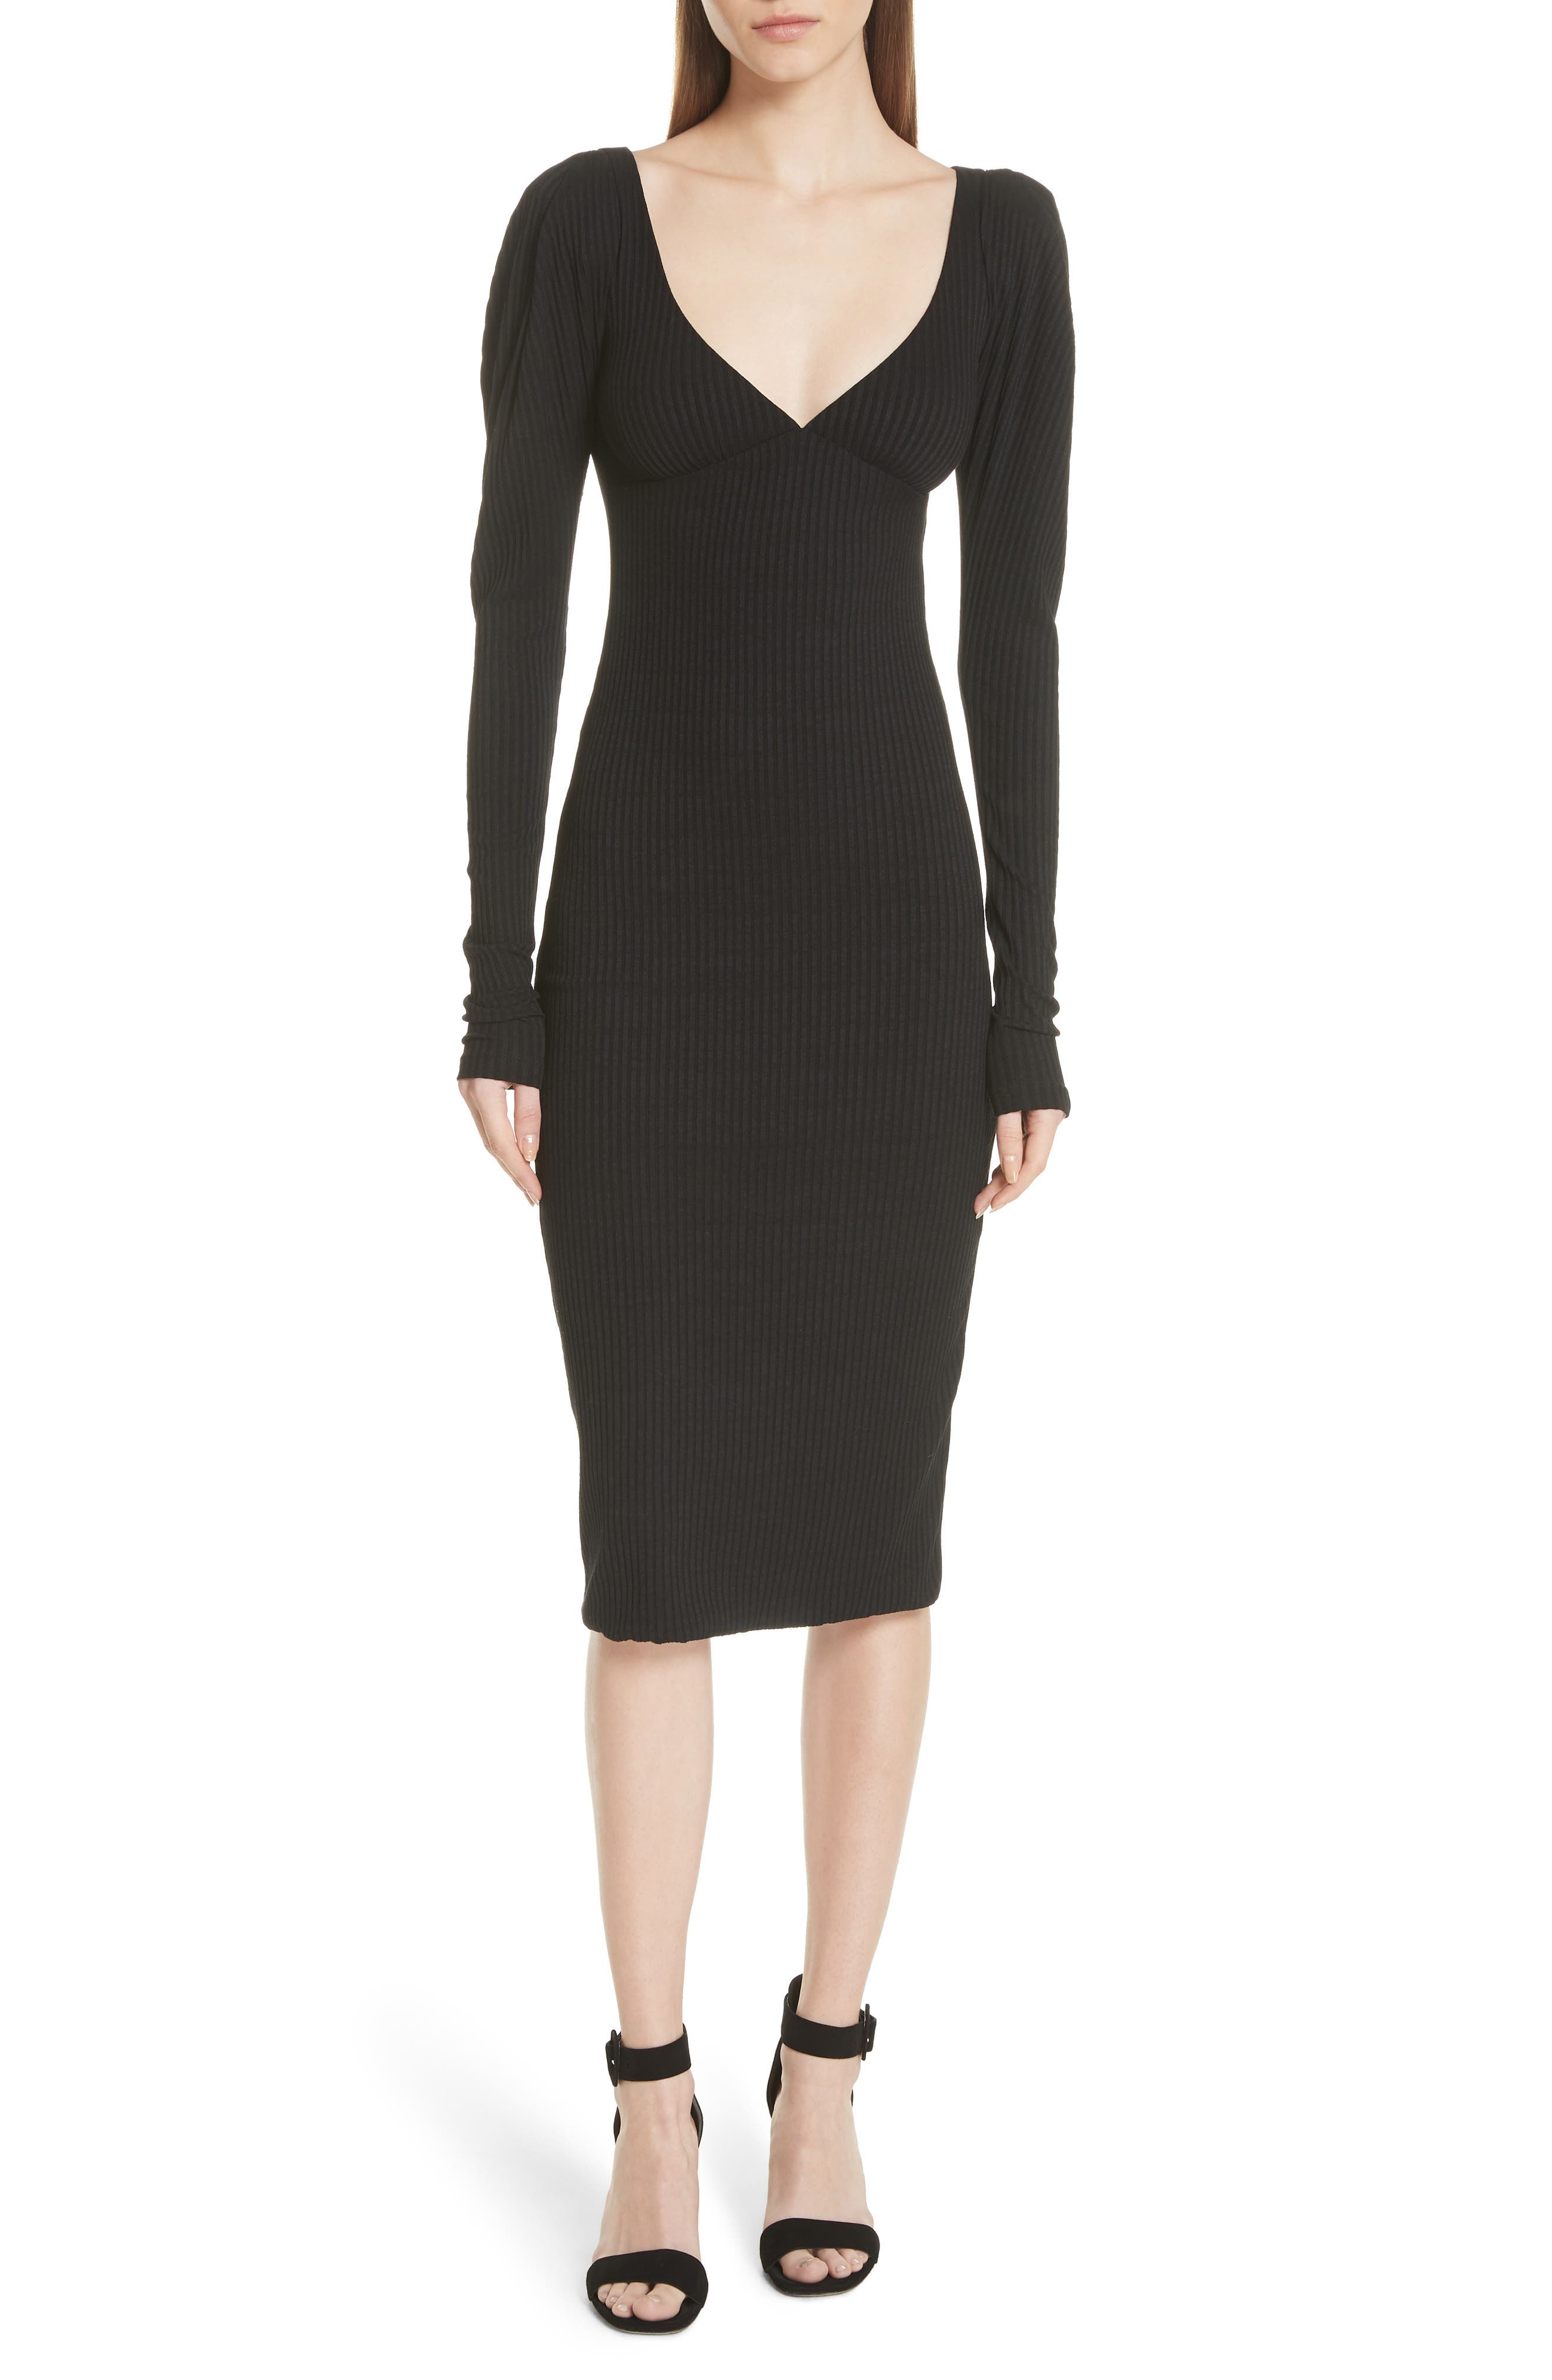 A.l.c. Dafne Puff Shoulder Body-Con Dress, Black